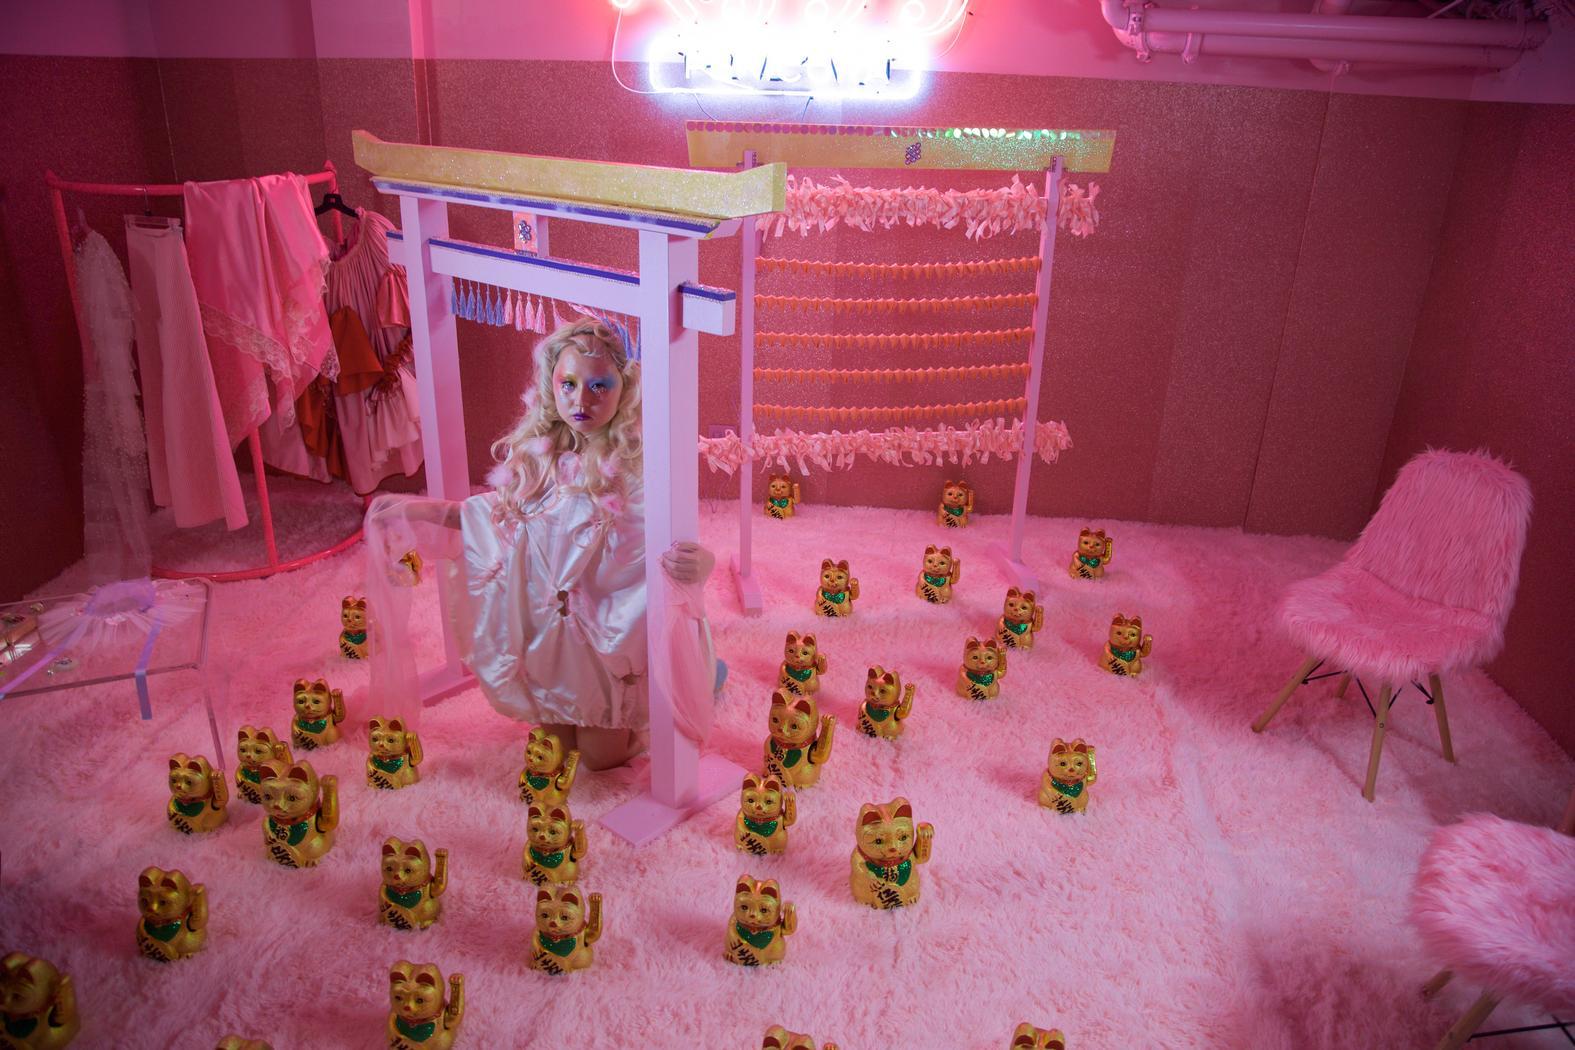 nyc art installation, nyc pop up, alice gao, pink room pink party, pink art, harajuku girl